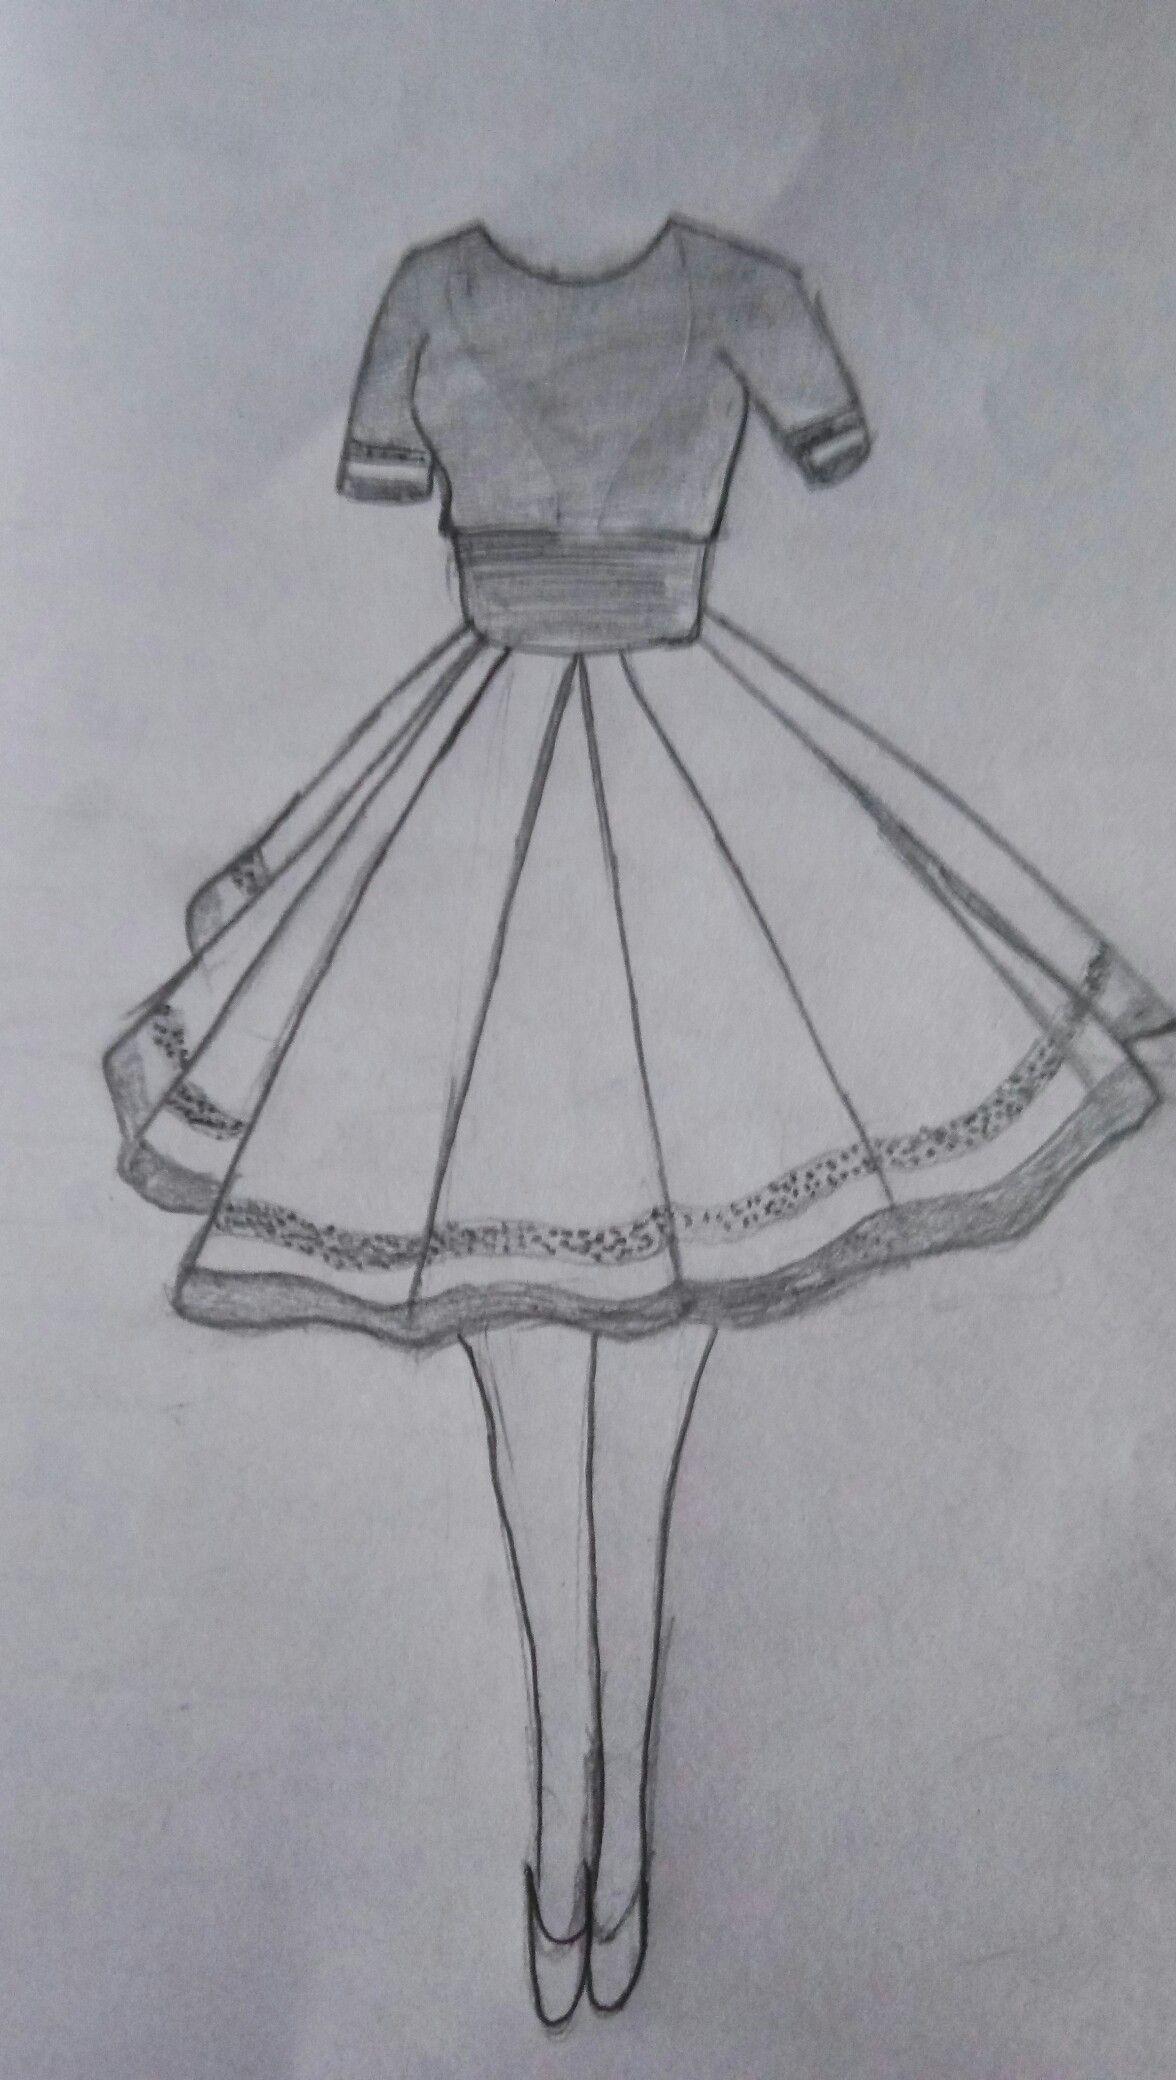 Haz Tu Propia Moda Cuaderno De Bocetos De Moda Dibujos De Diseno De Moda Dibujo De Diseno De Vestido